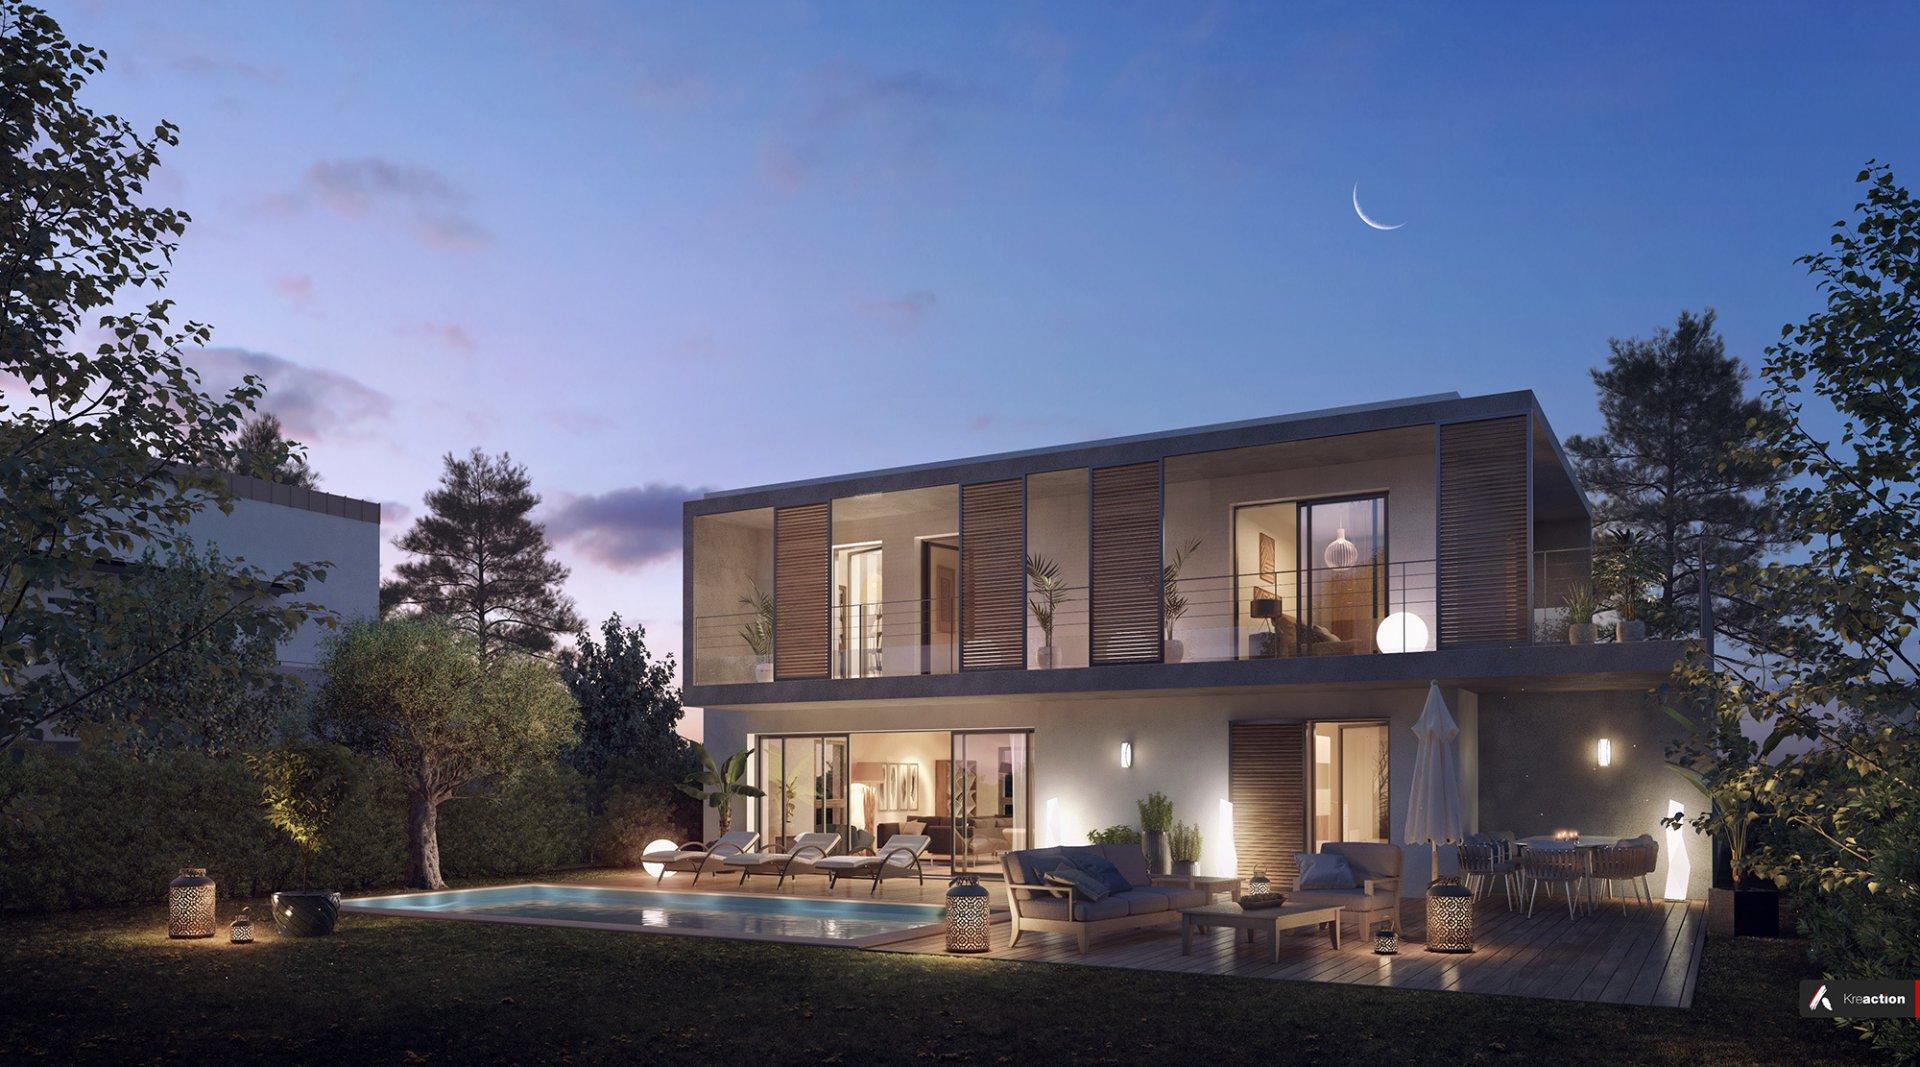 4 bedroom villa in new programme Roquette sur Siagne